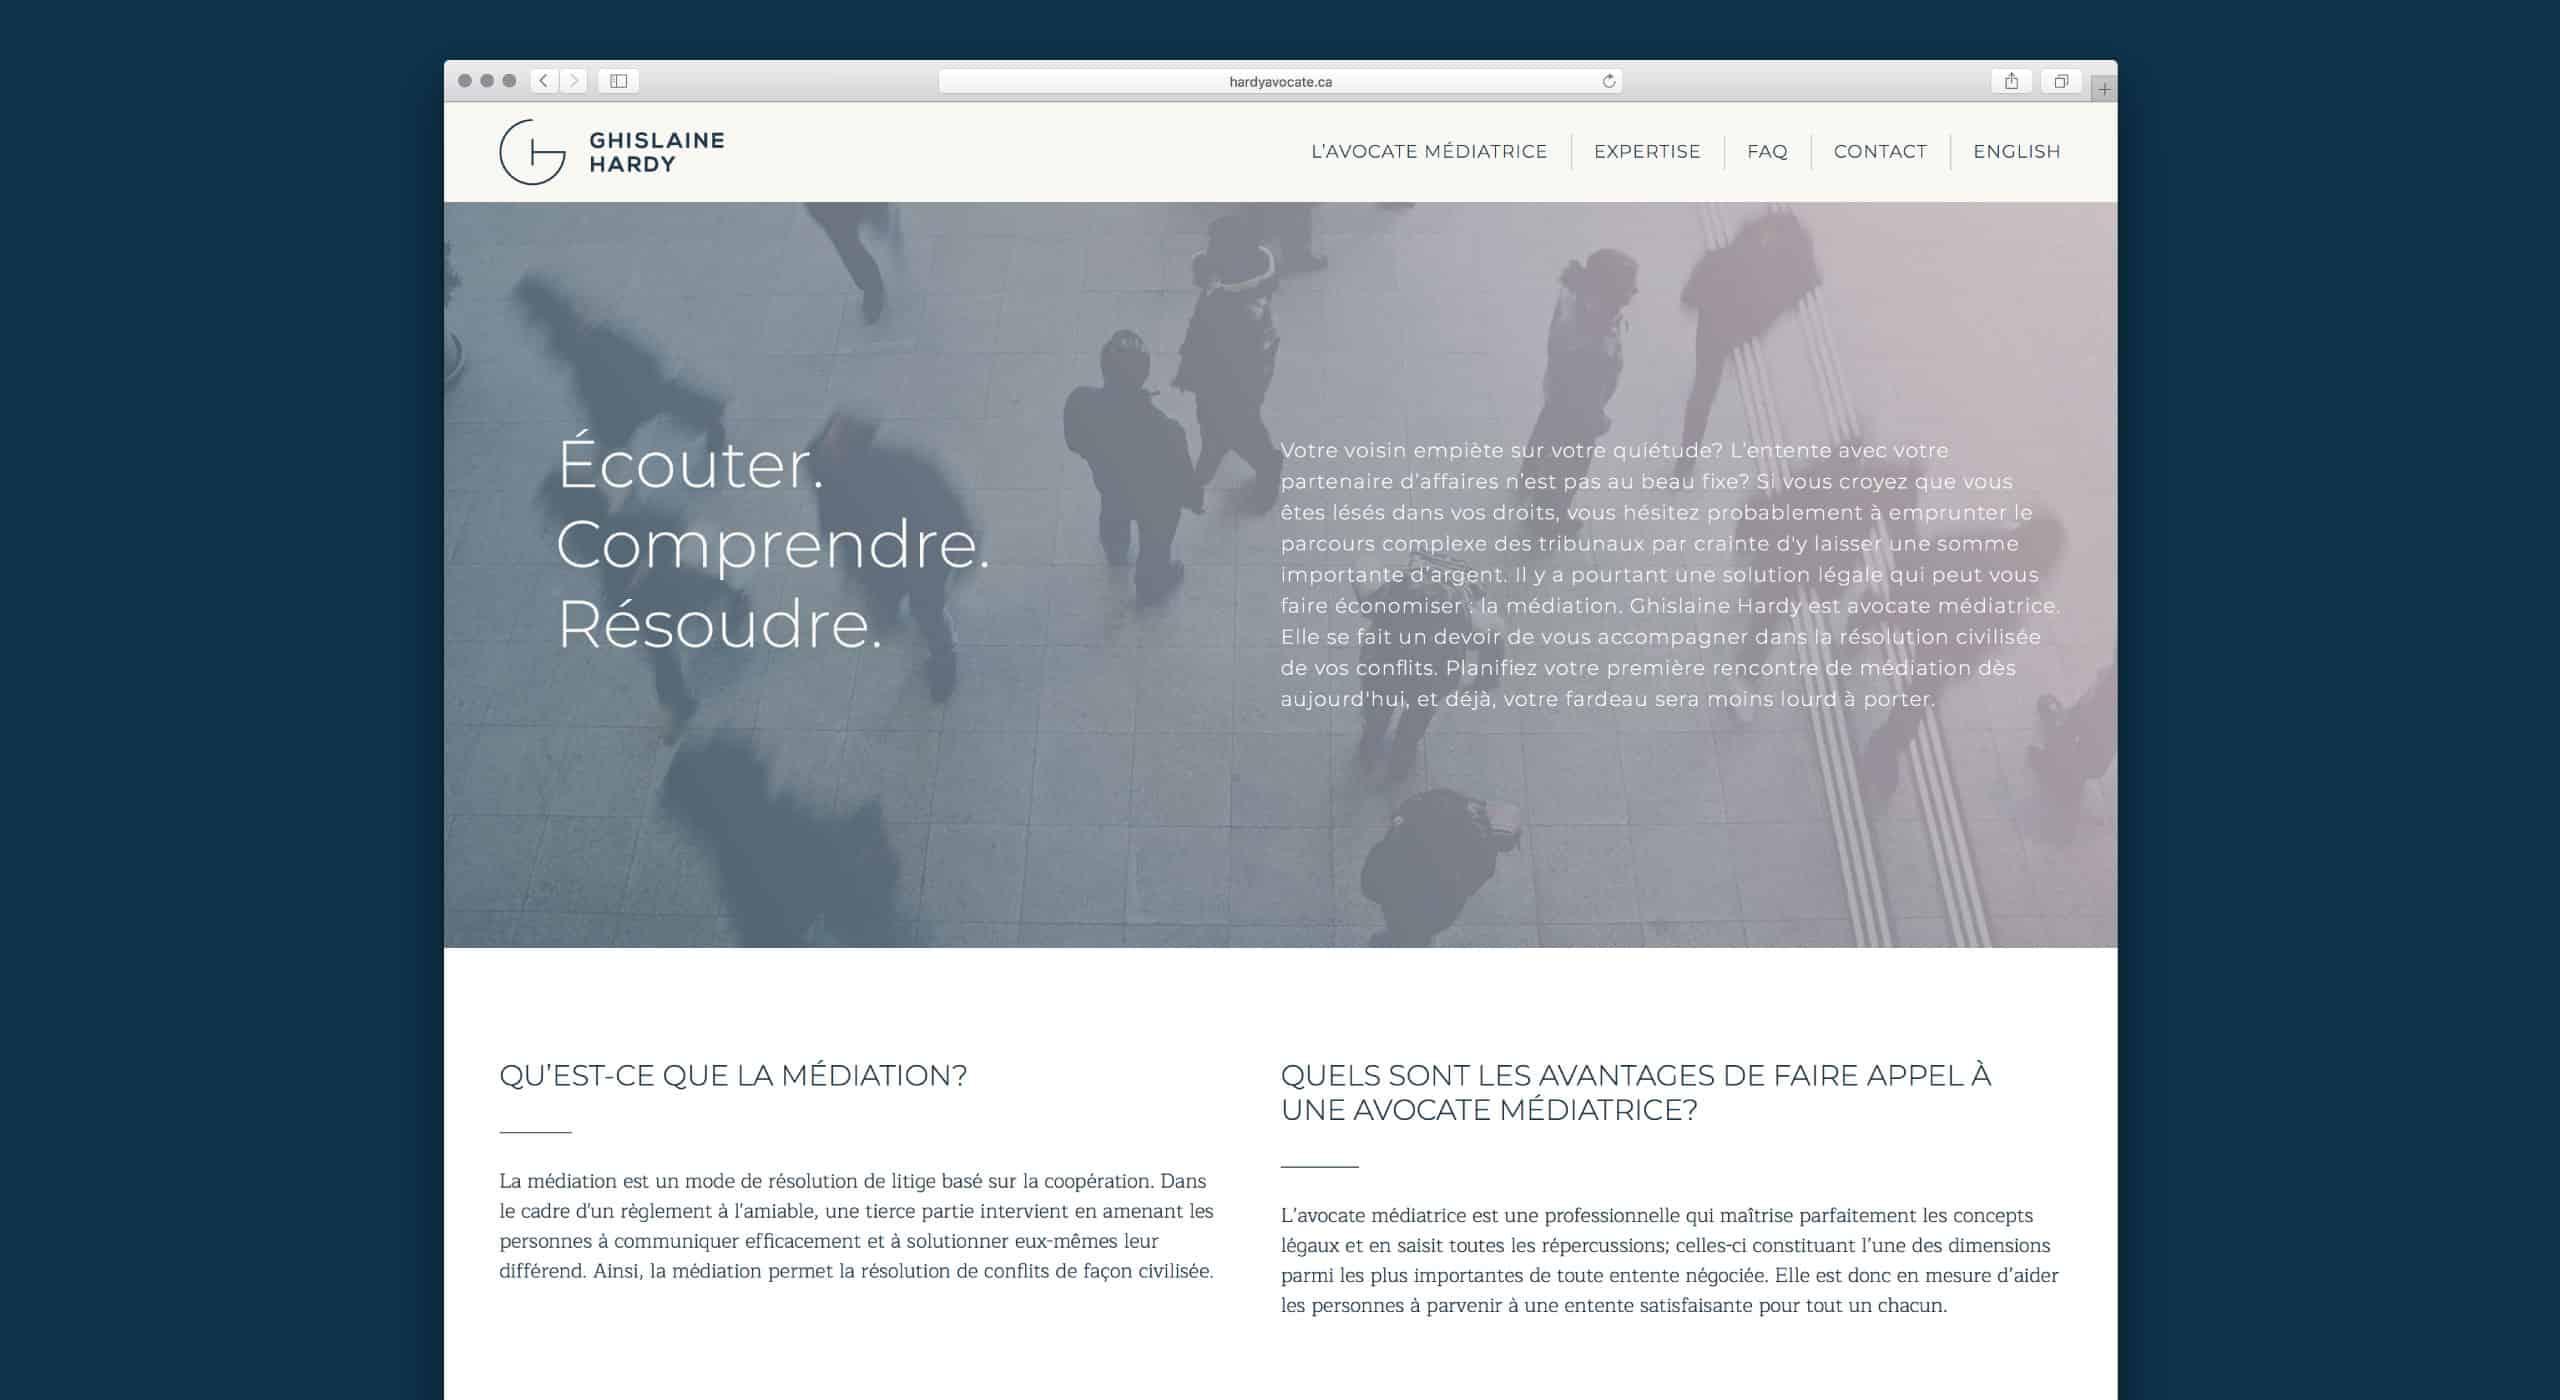 MlleRouge_GhislaineHardy_Montage_Identite_SiteWeb1